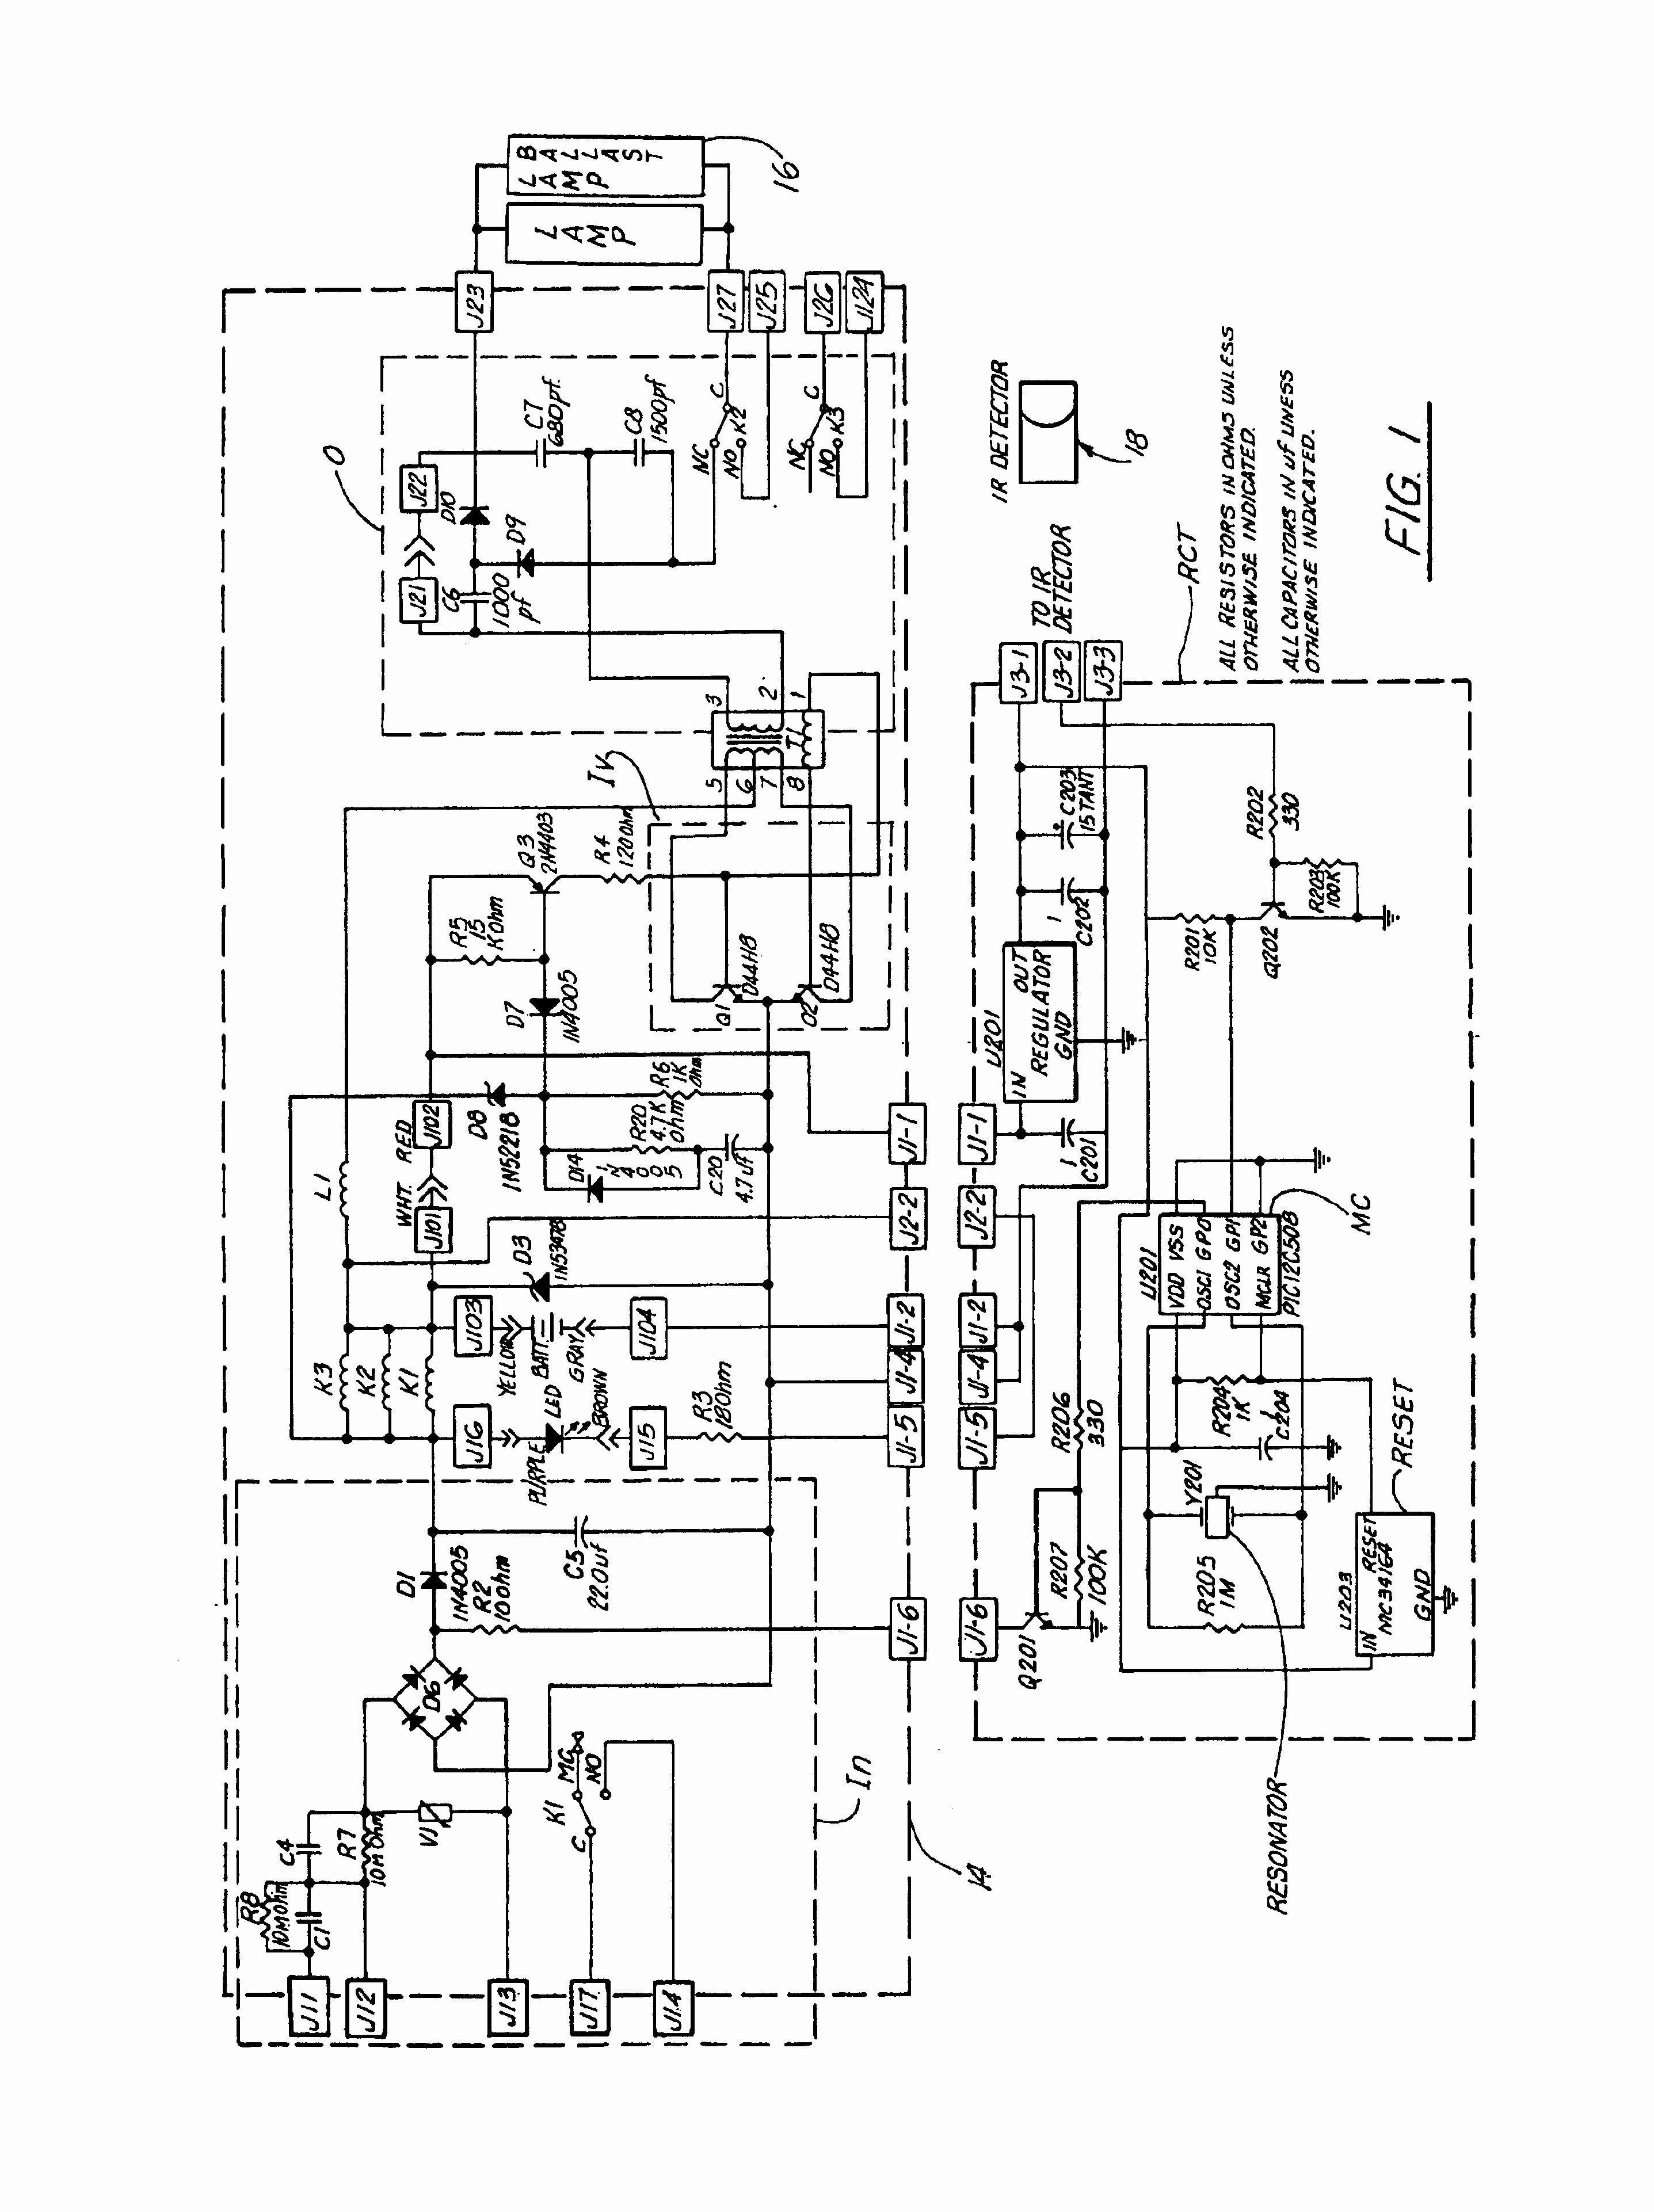 Sylvania Quicktronic Ballast Wiring Diagram Fresh T8 Electronic - Ballast Wiring Diagram